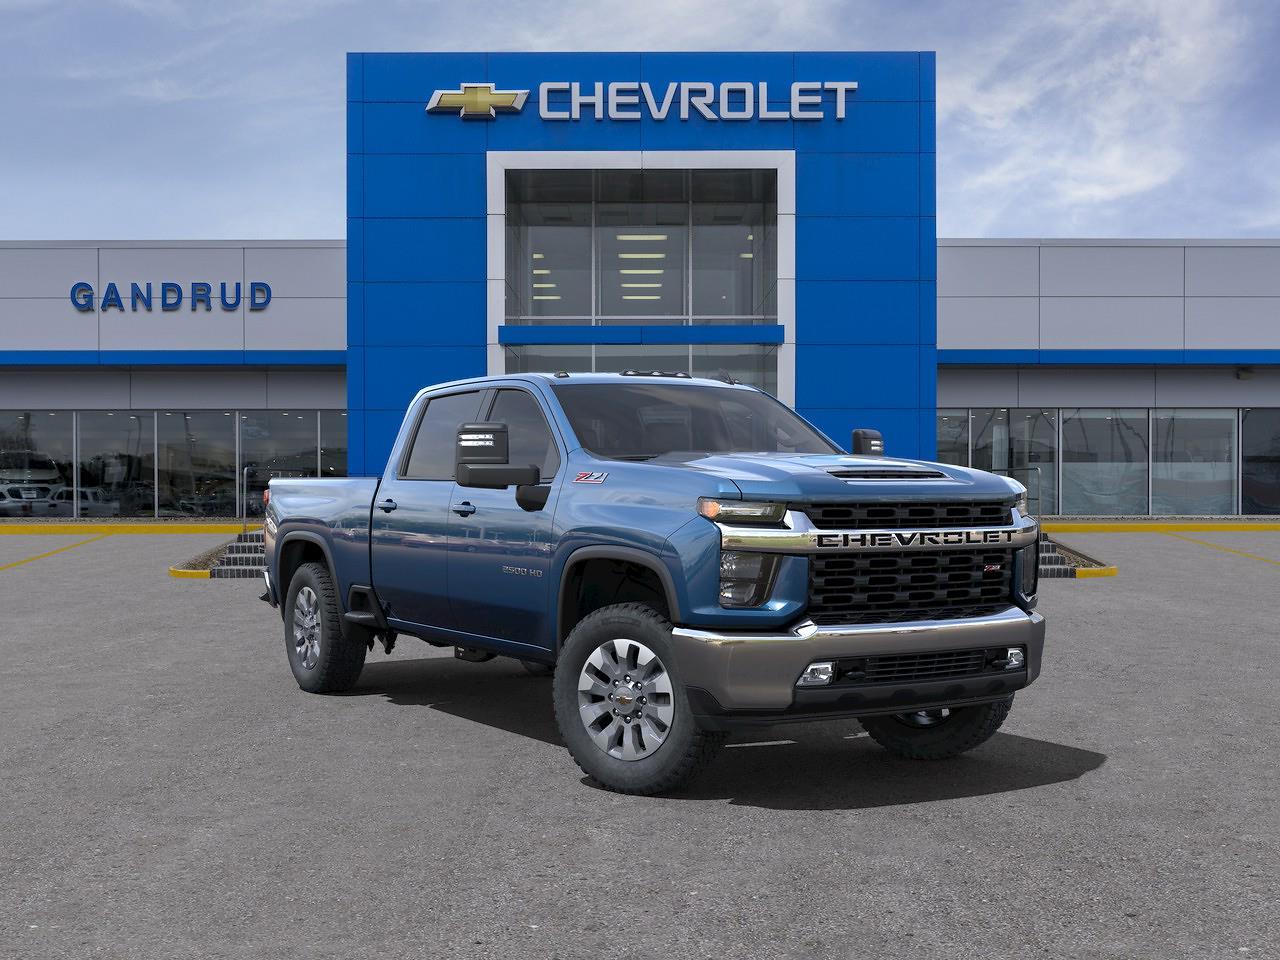 2021 Chevrolet Silverado 2500 Crew Cab 4x4, Pickup #M1319 - photo 1